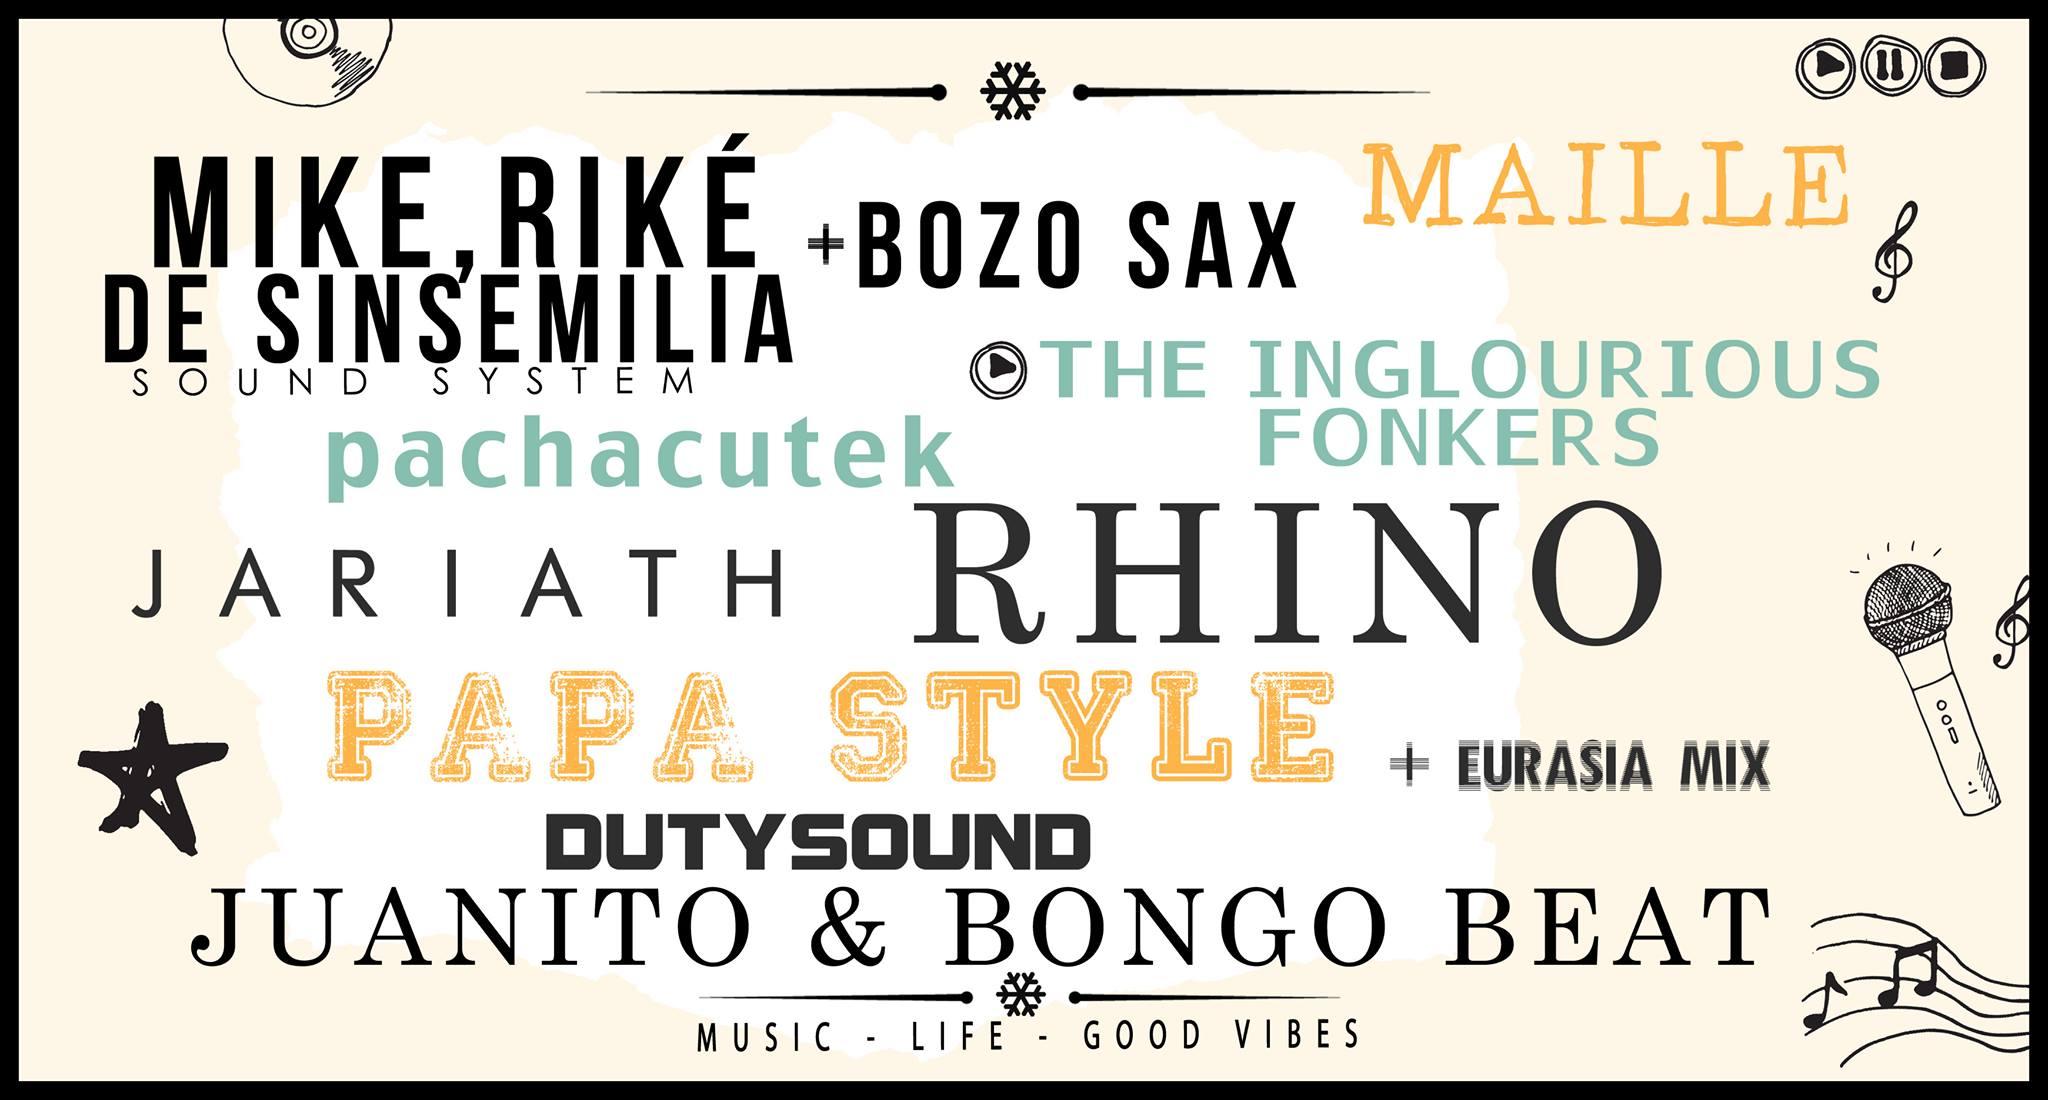 Loft festival juantito bongo beat super devoluy